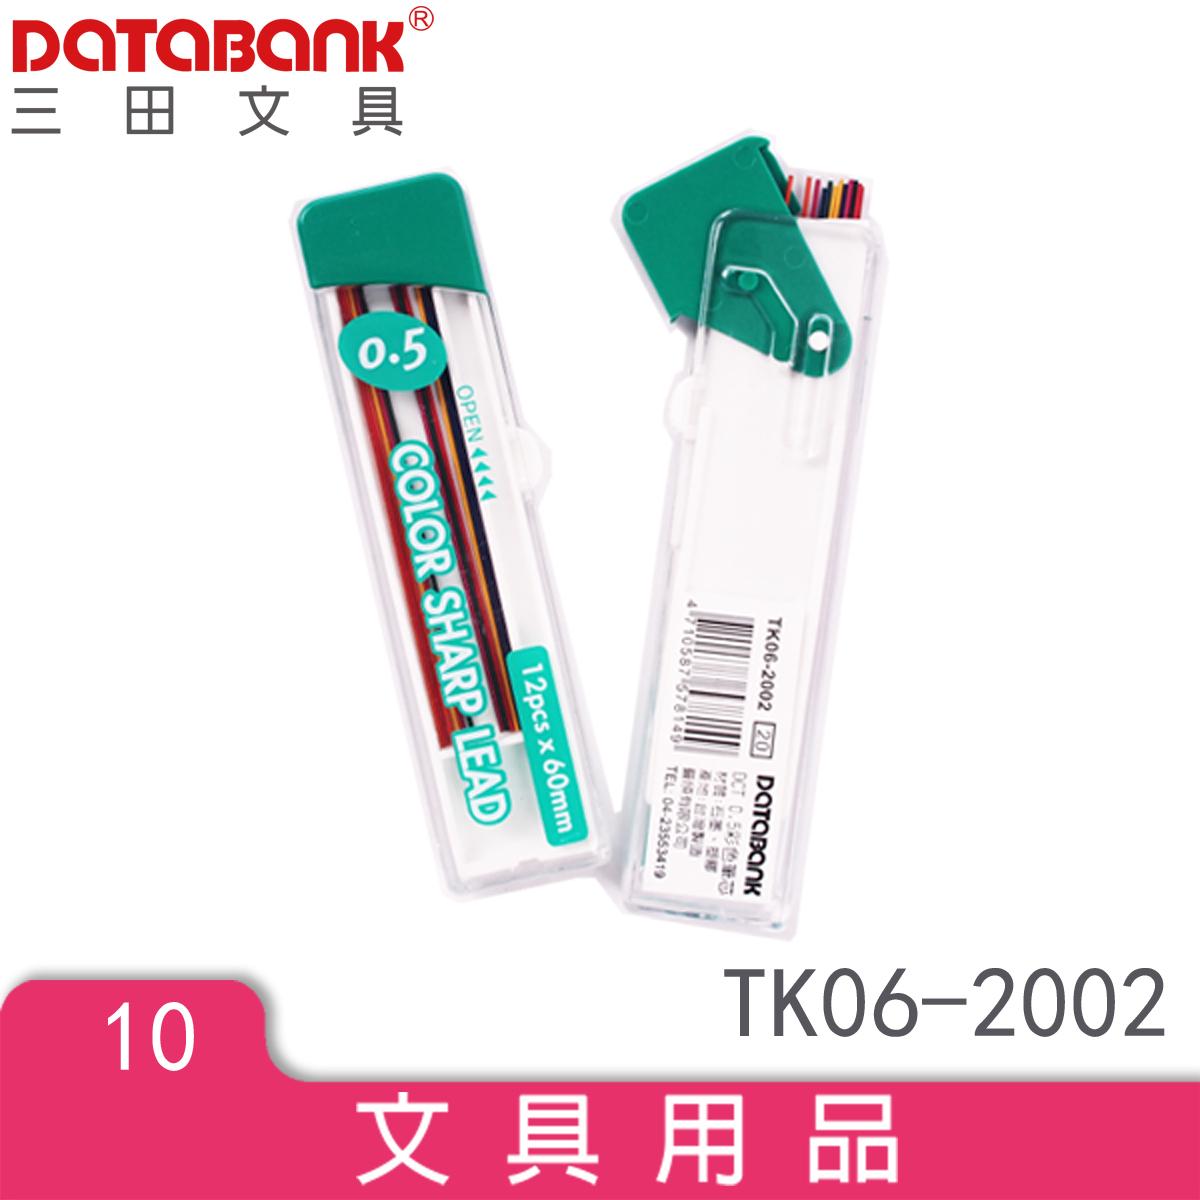 DCT 0.5彩色筆蕊 筆芯(TK06-2002) 開學用品 文具批發 超低優惠 DATABANK